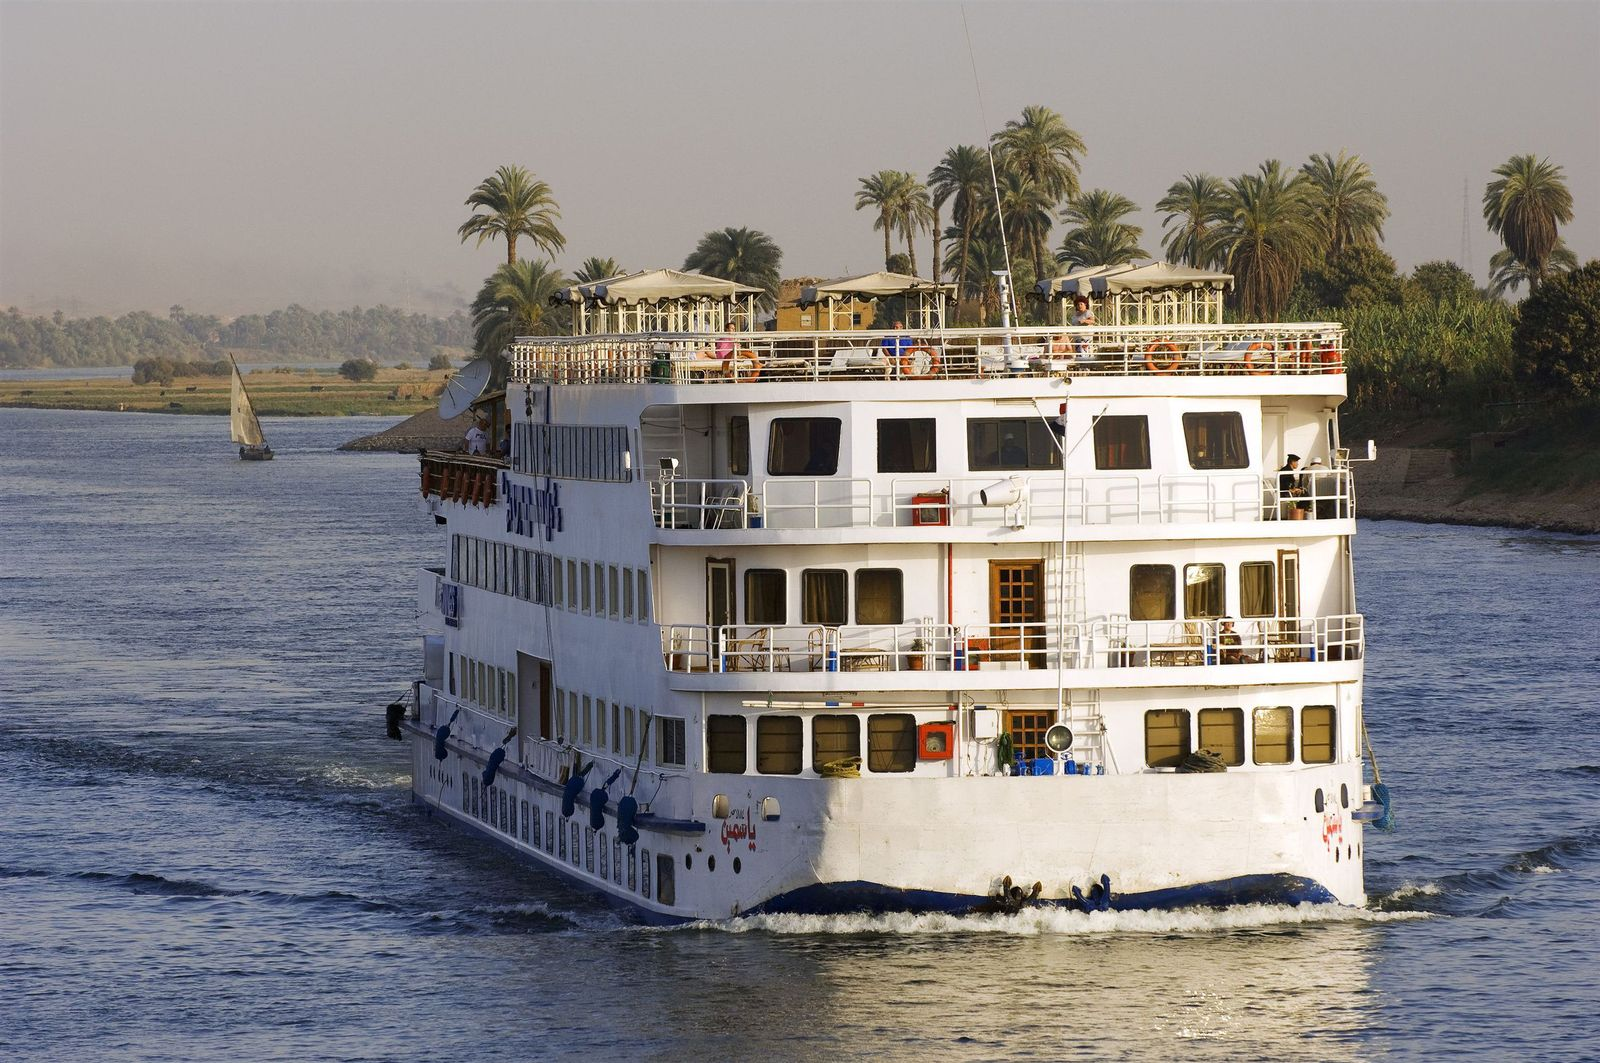 Nil / Kreuzfahrt / Fluss